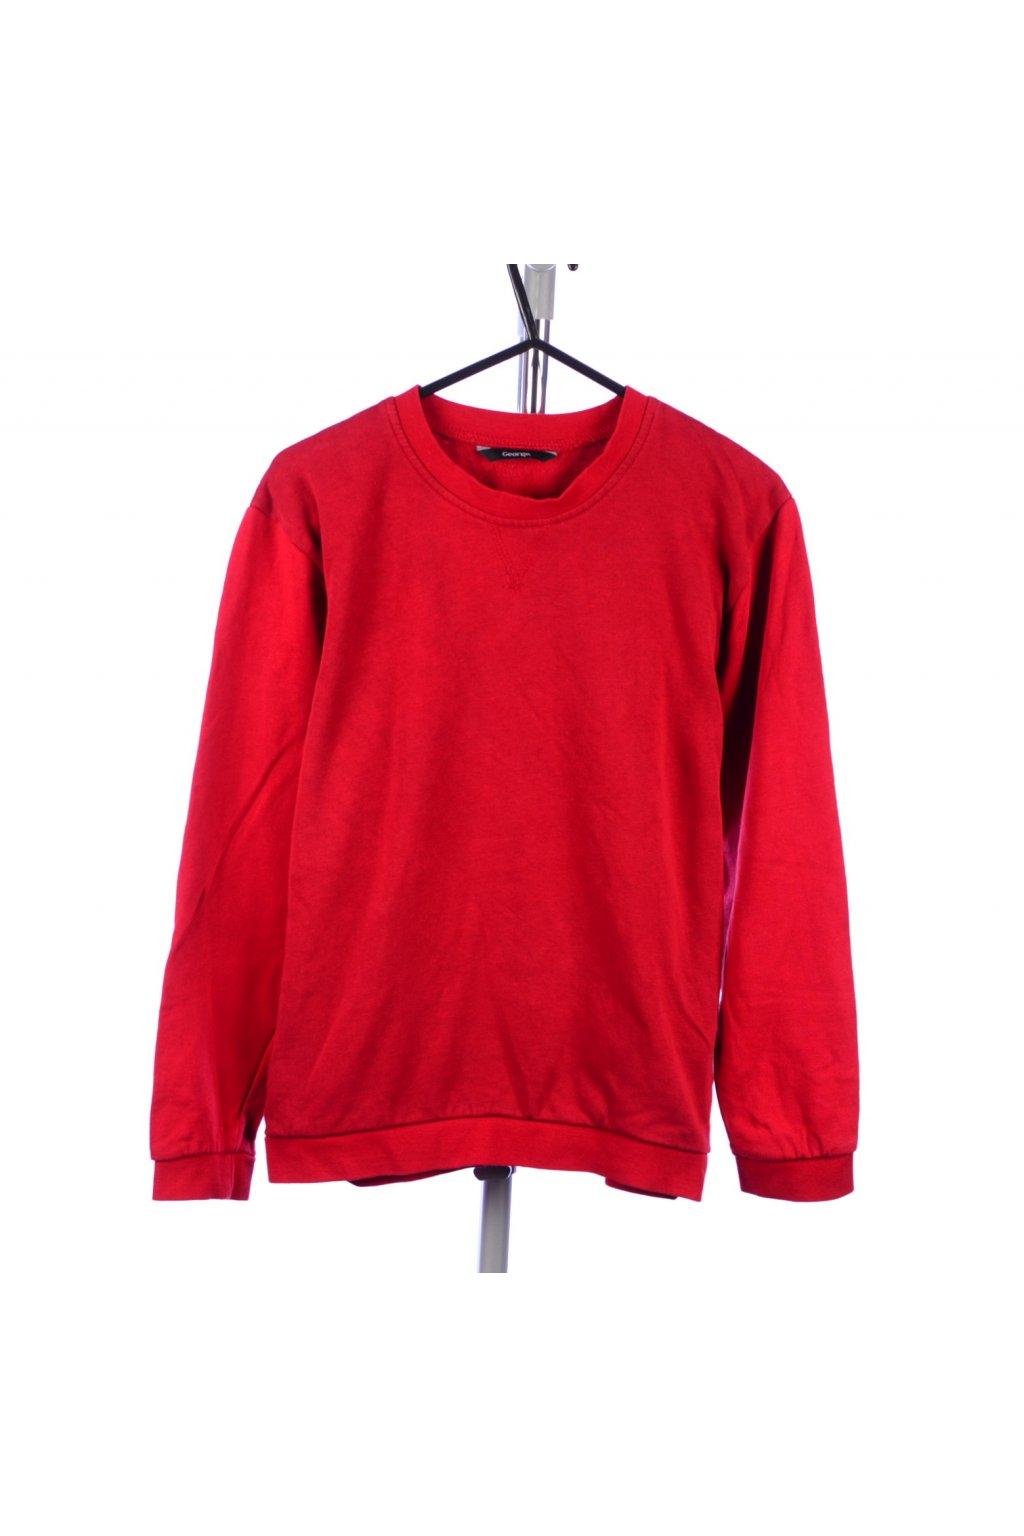 Mikina George červená vel. 146 - 152